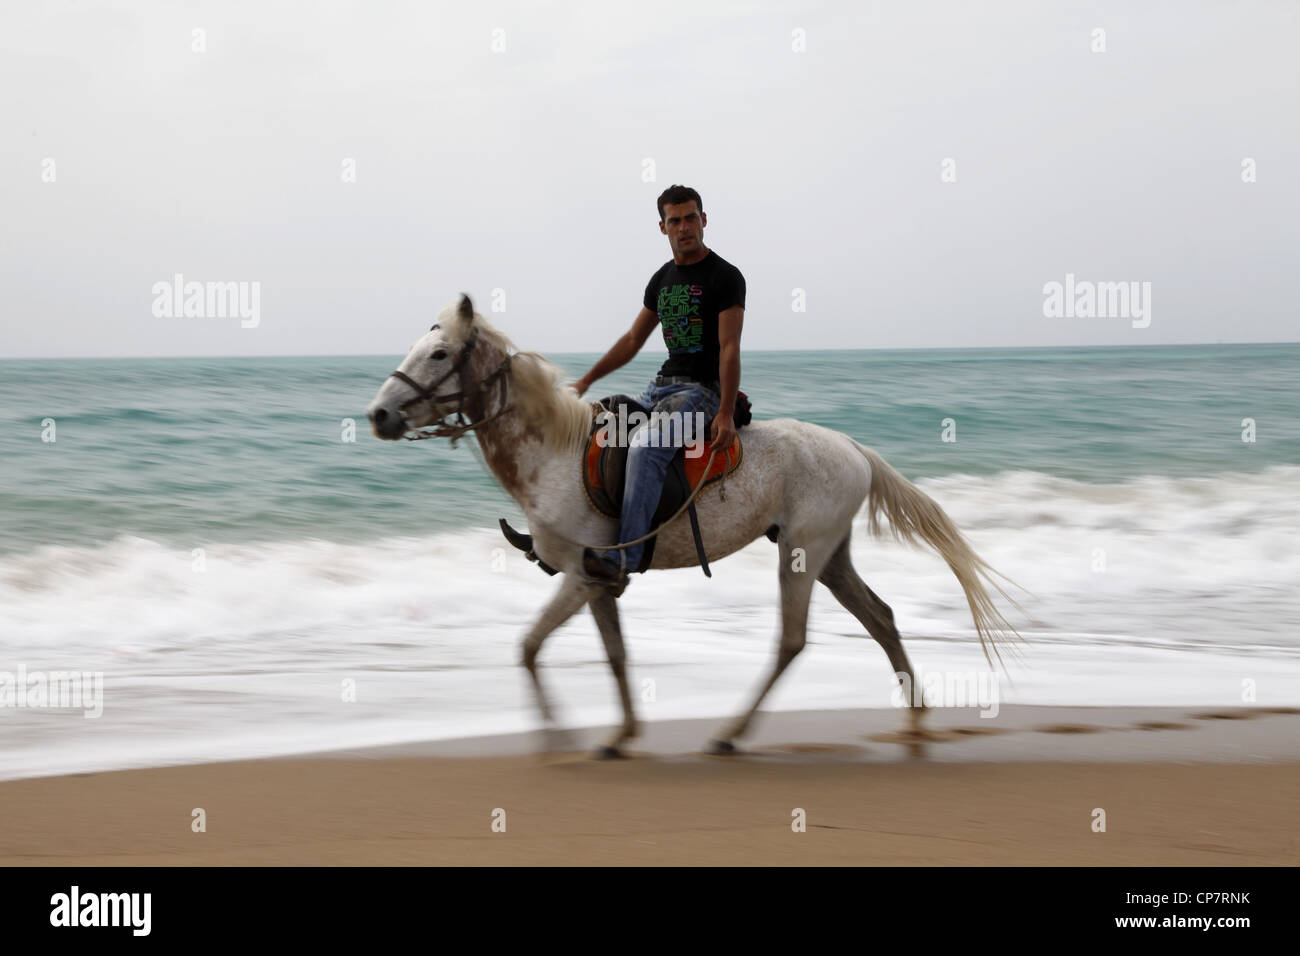 MAN ON WHITE HORSE MEDITERRANEAN COAST SIDE TURKEY 15 April 2012 - Stock Image